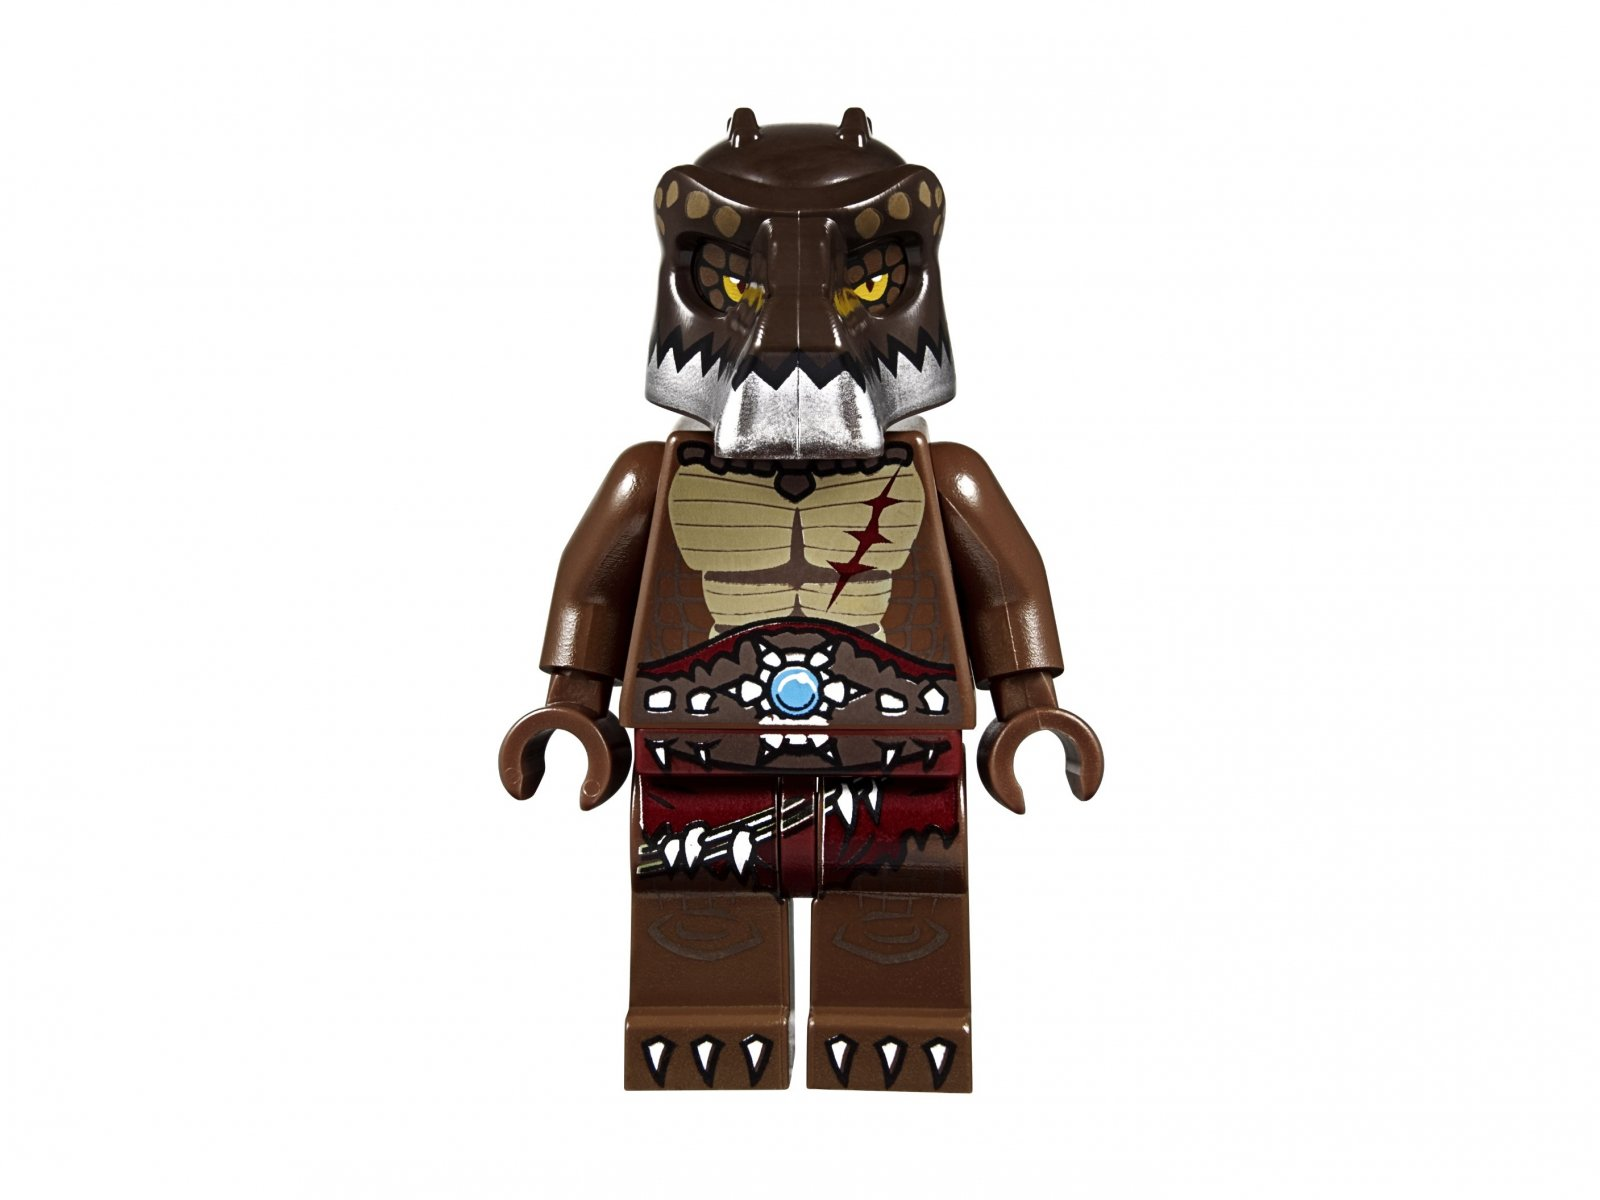 LEGO Legends of Chima™ 30252 Crug's Swamp Jet